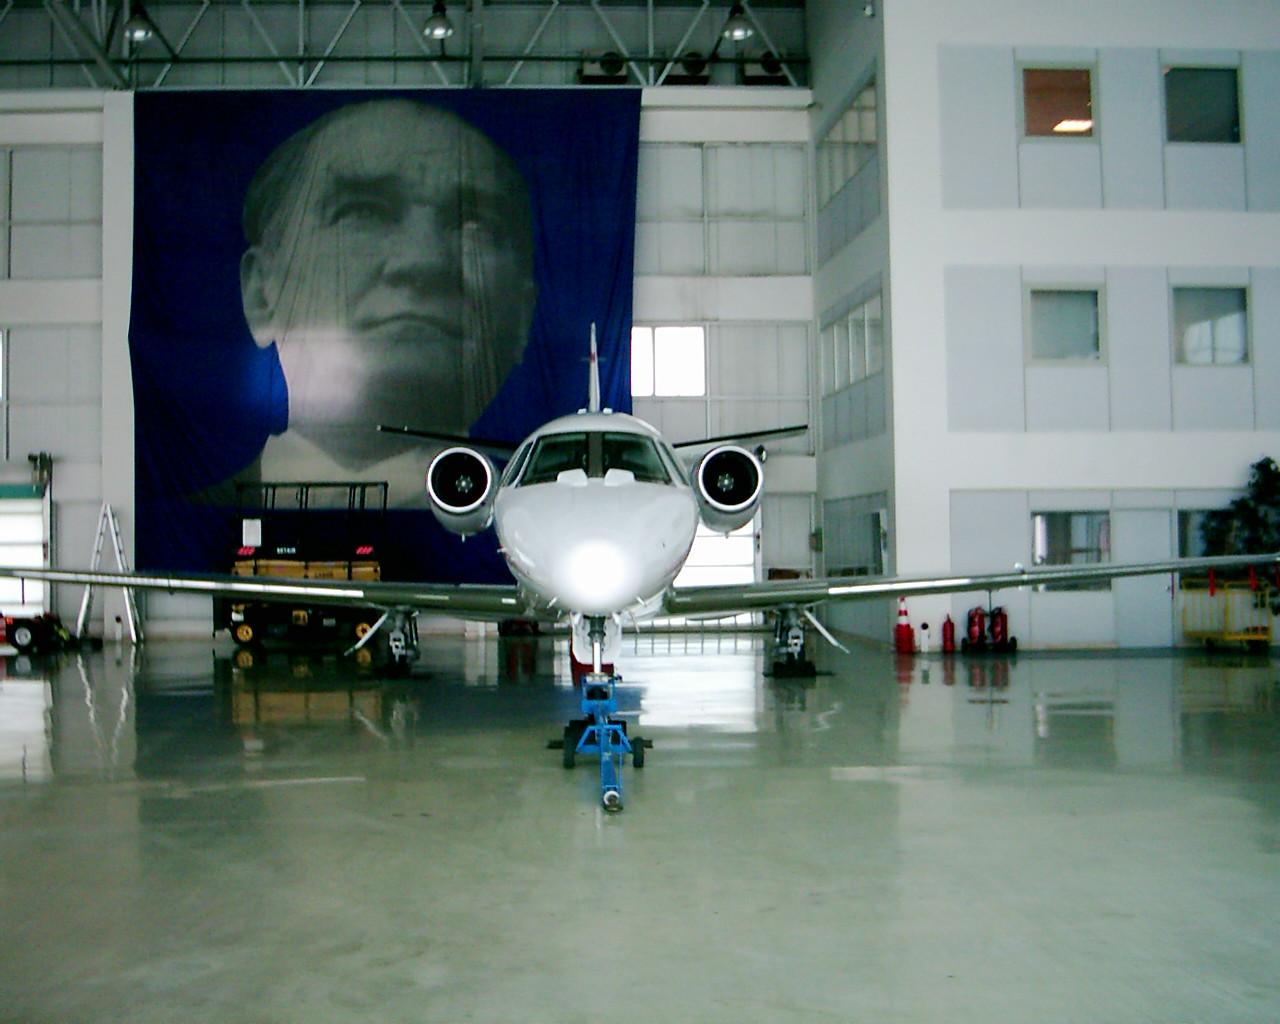 Inchirieri avion privat - Inchiriere jet privat